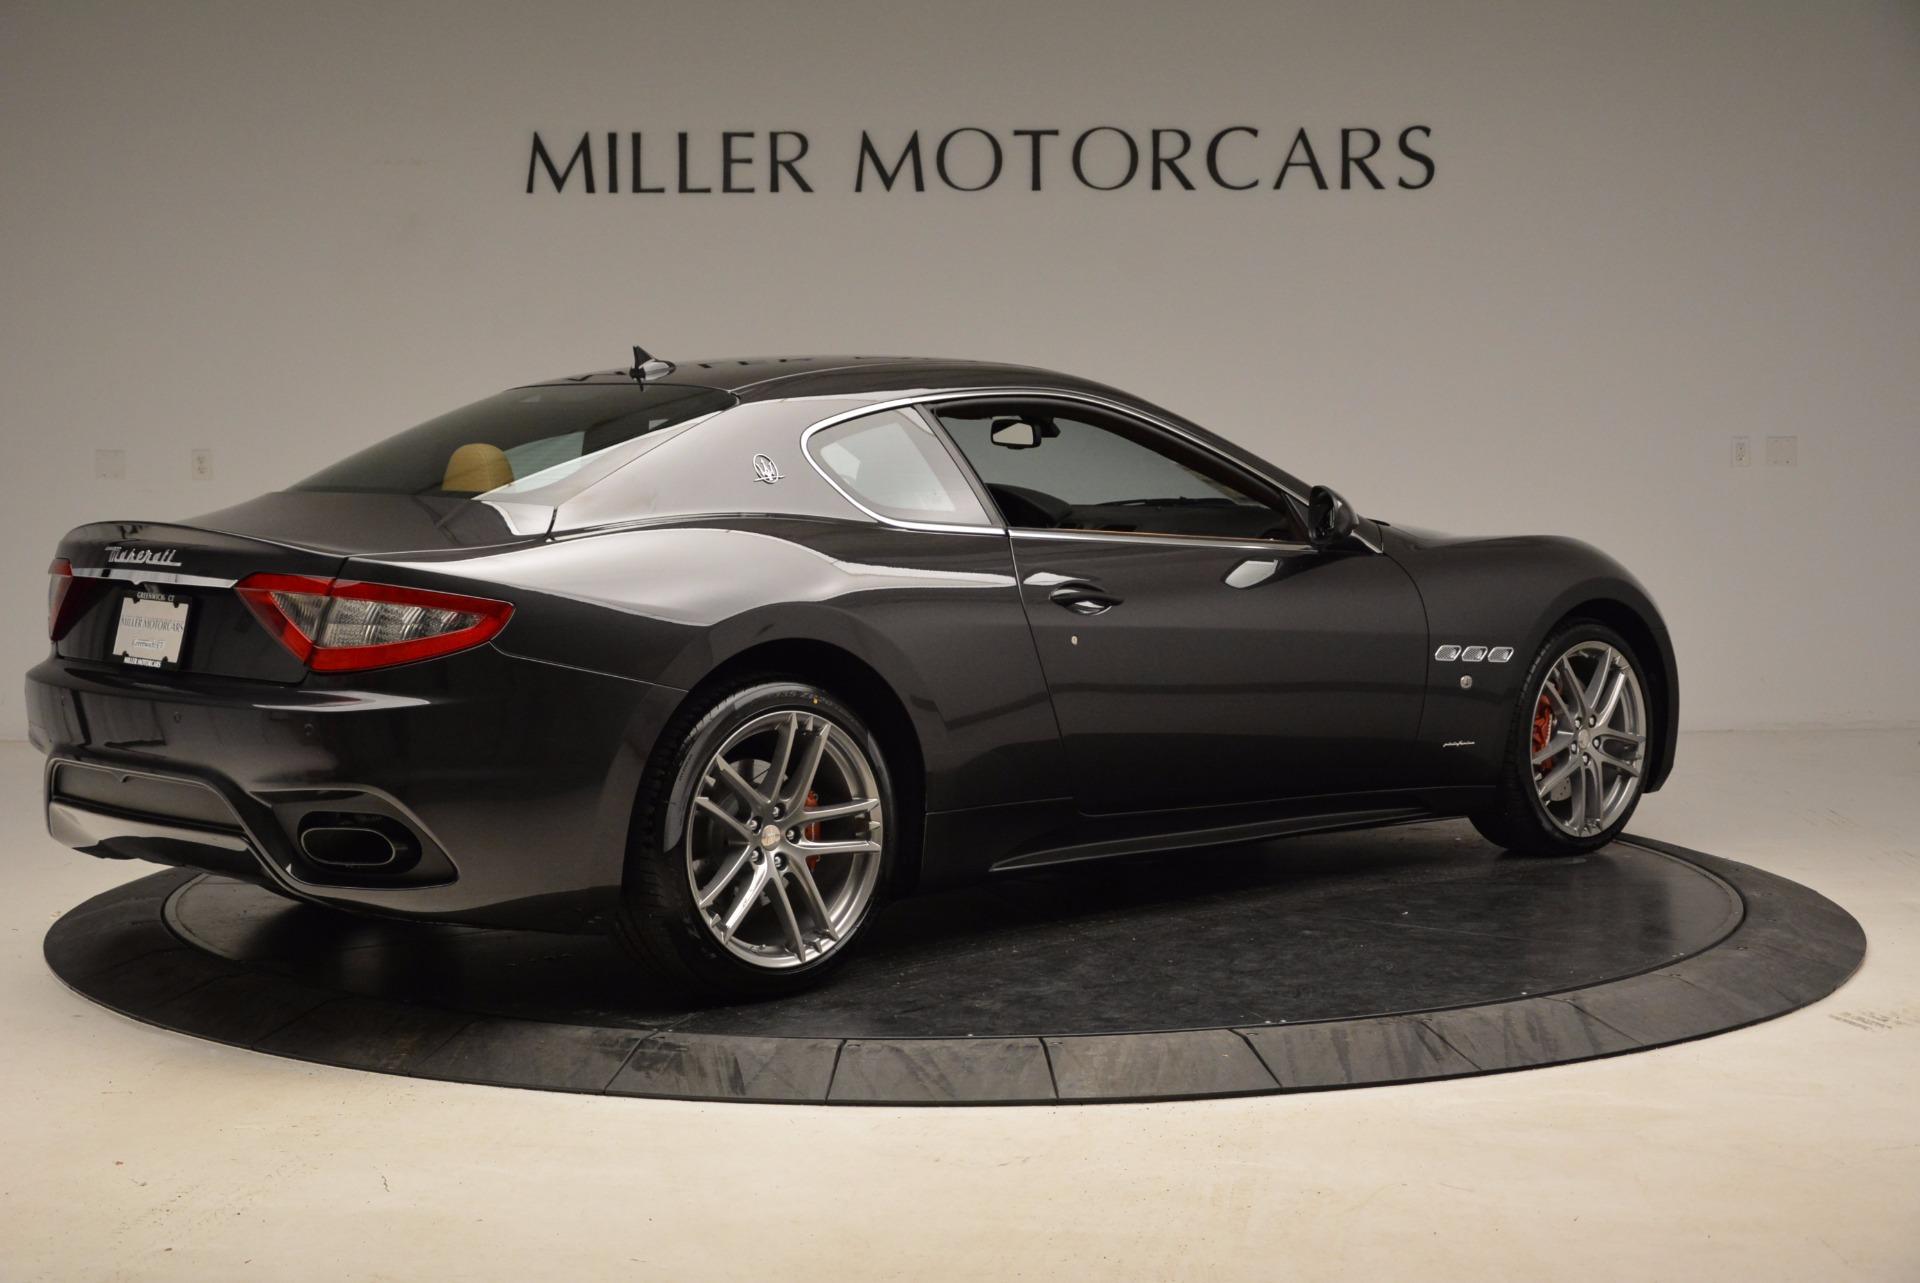 New 2018 Maserati GranTurismo Sport Coupe For Sale In Westport, CT 1771_p8